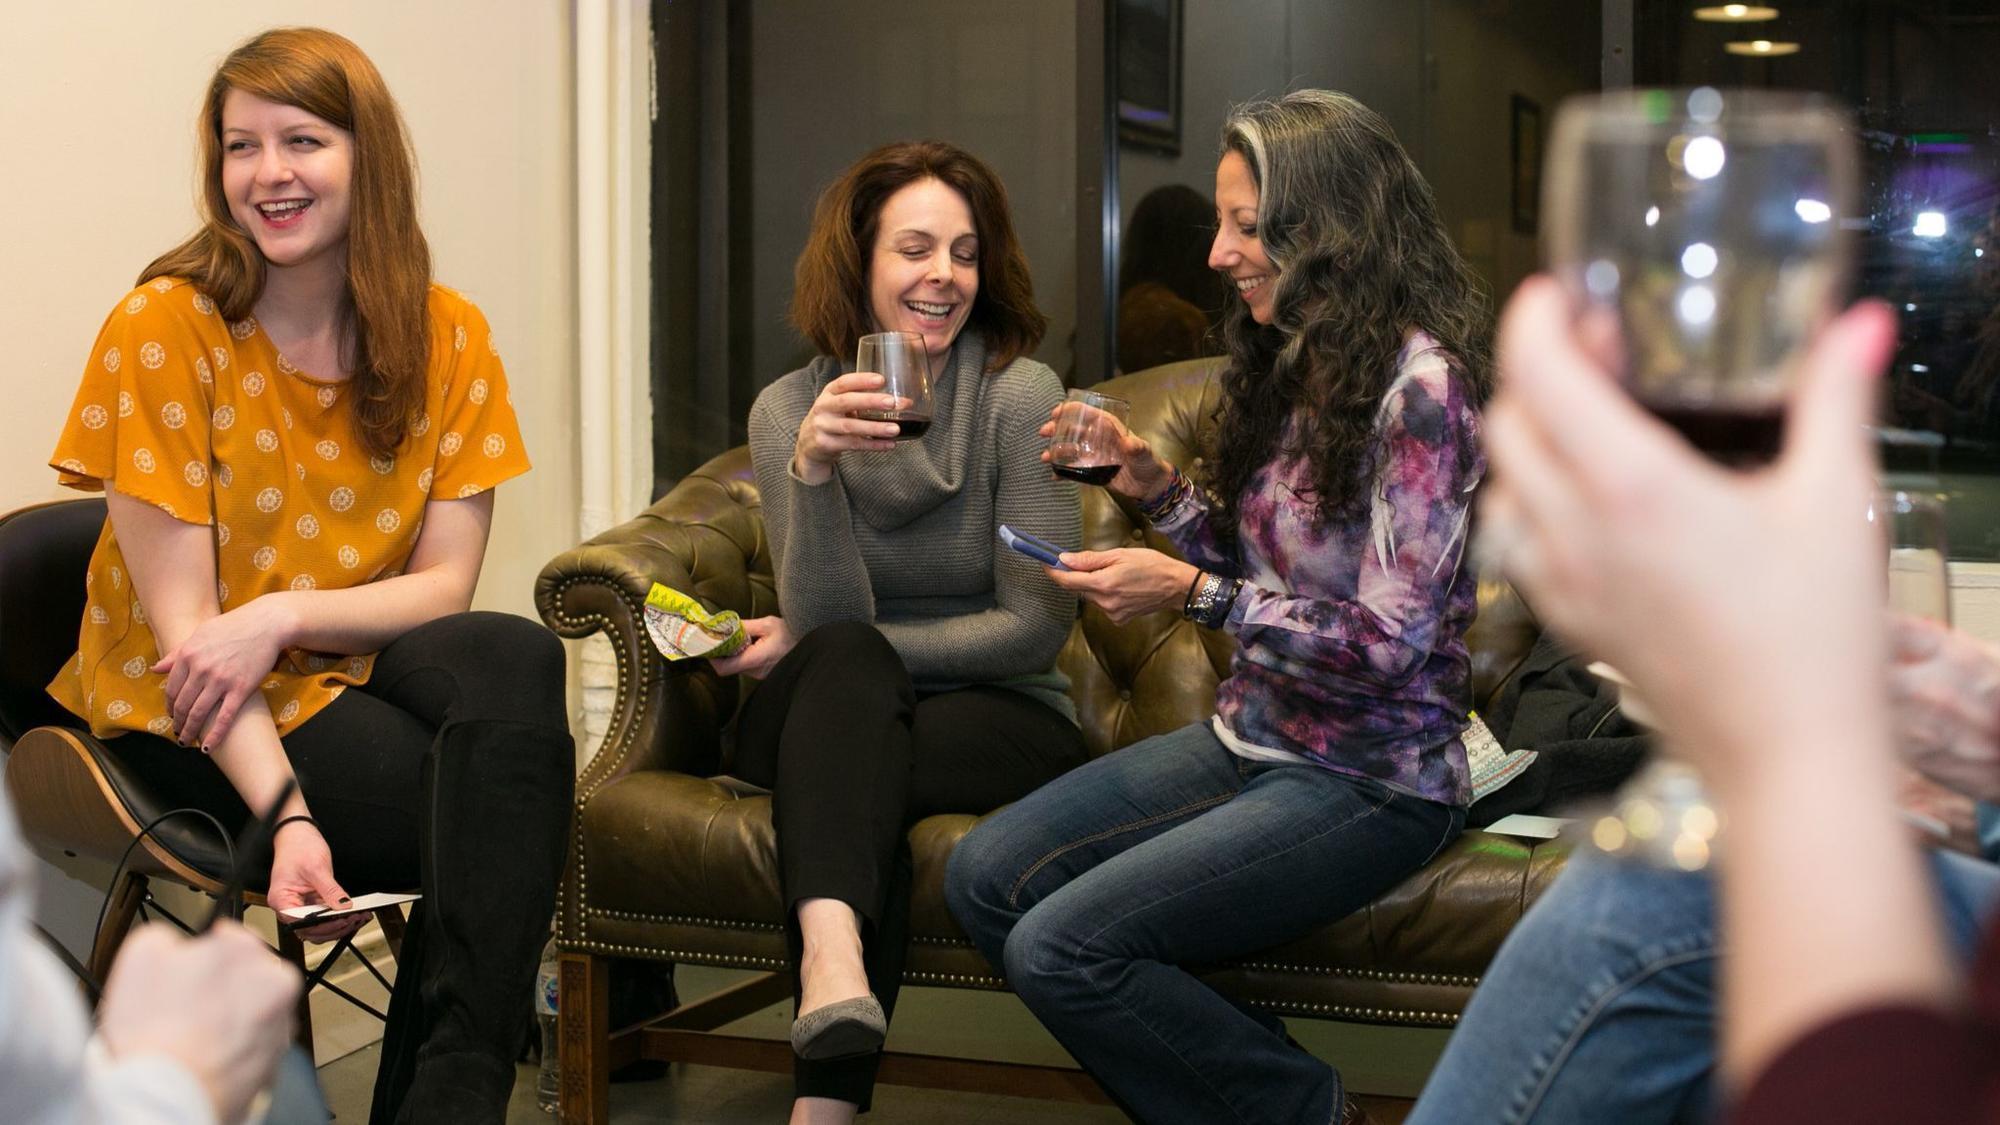 Women, especially millennials, are driving wine trends